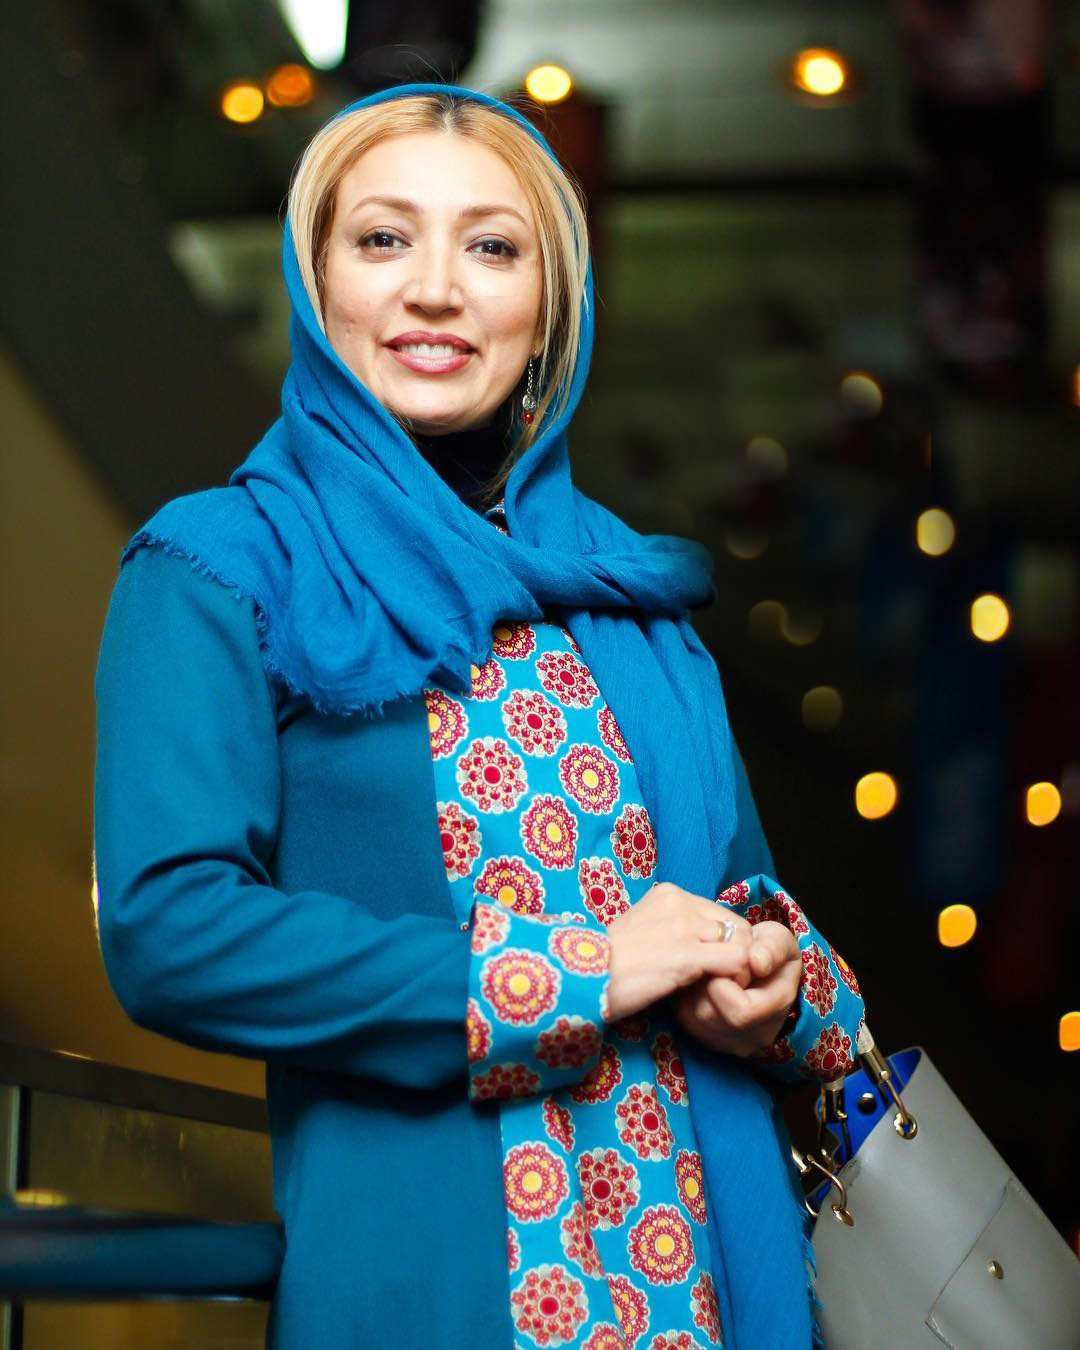 نگار عابدی، بازیگر سینما و تلویزیون - عکس جشنواره